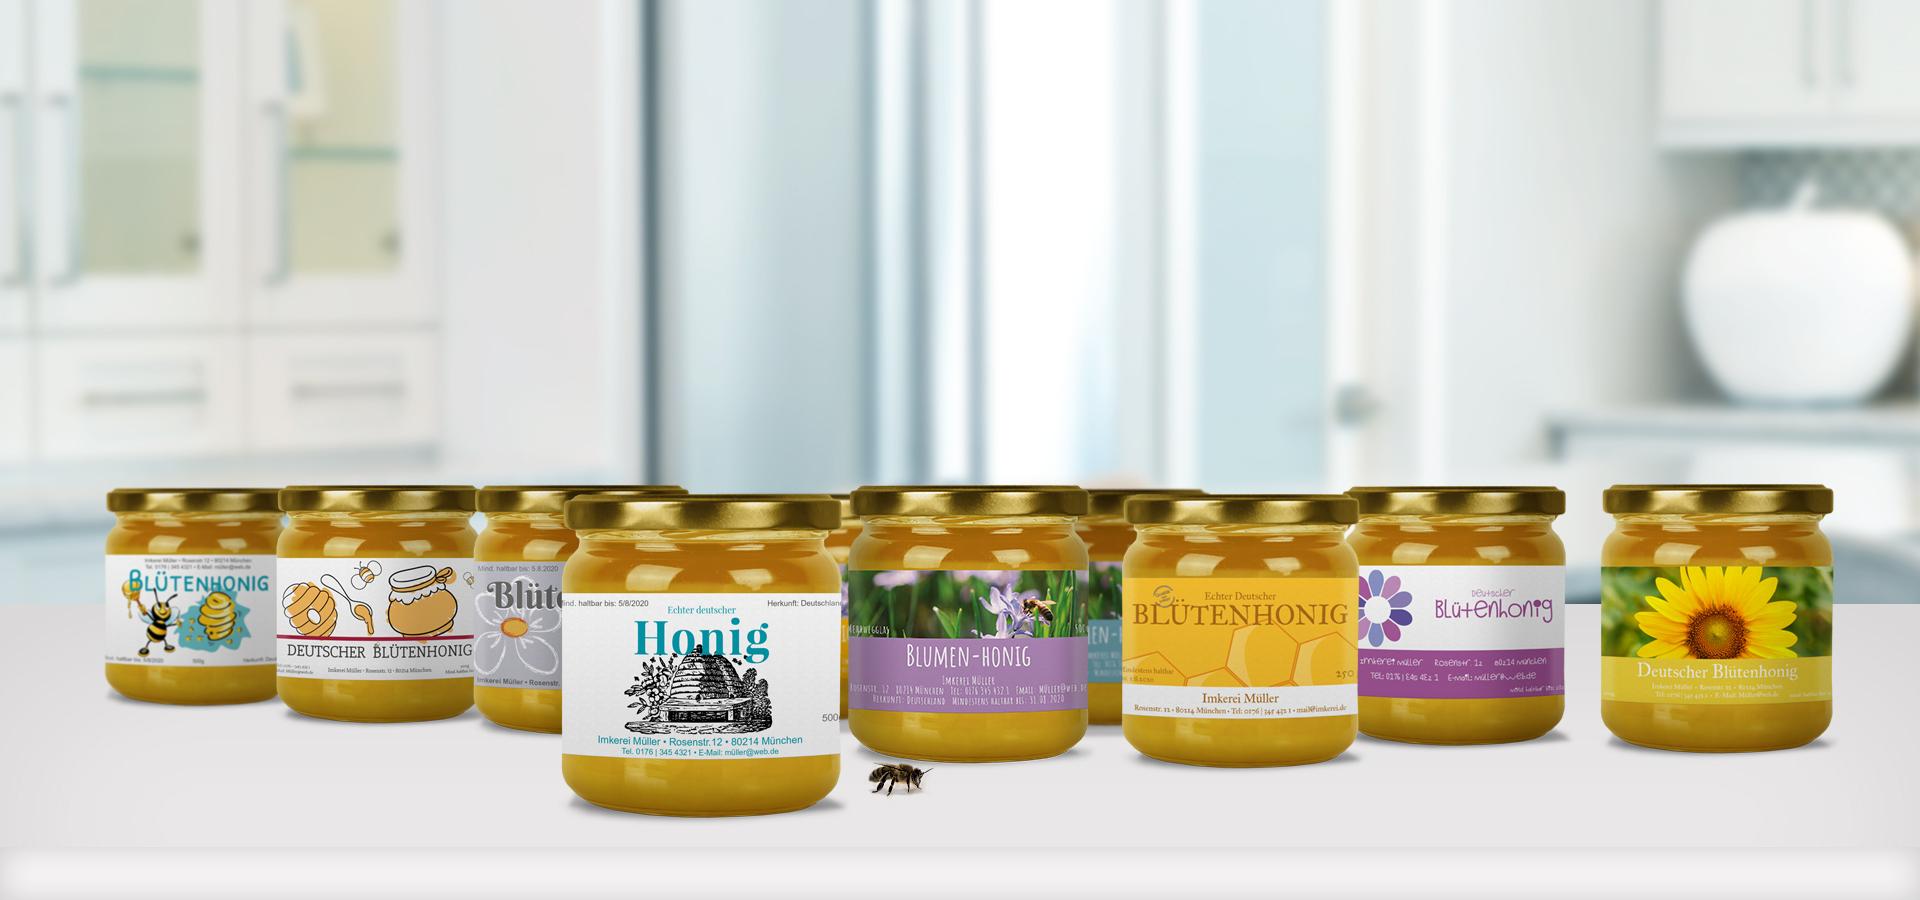 Die Honigwerkstatt